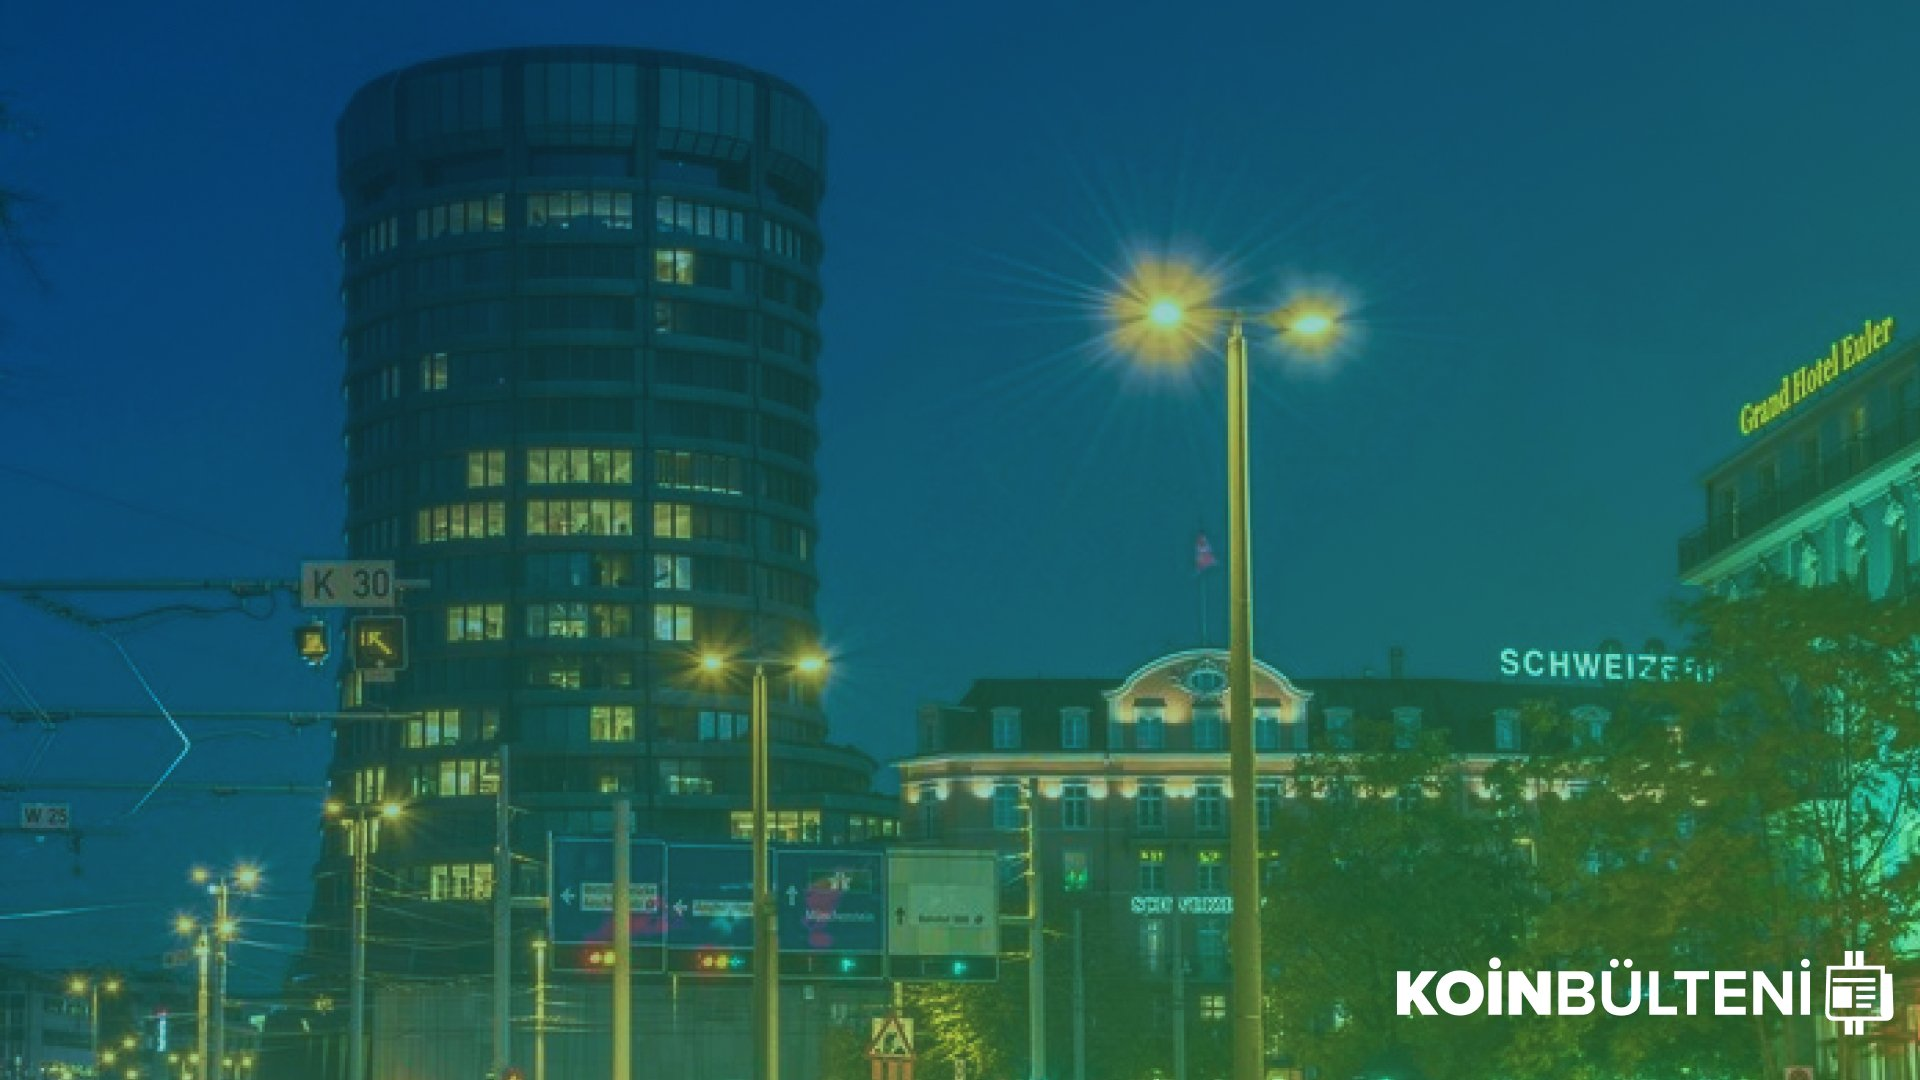 BAE, Çin, Hong Kong ve Tayland Merkez Bankalarından Ortak Dijital Para Deneyi